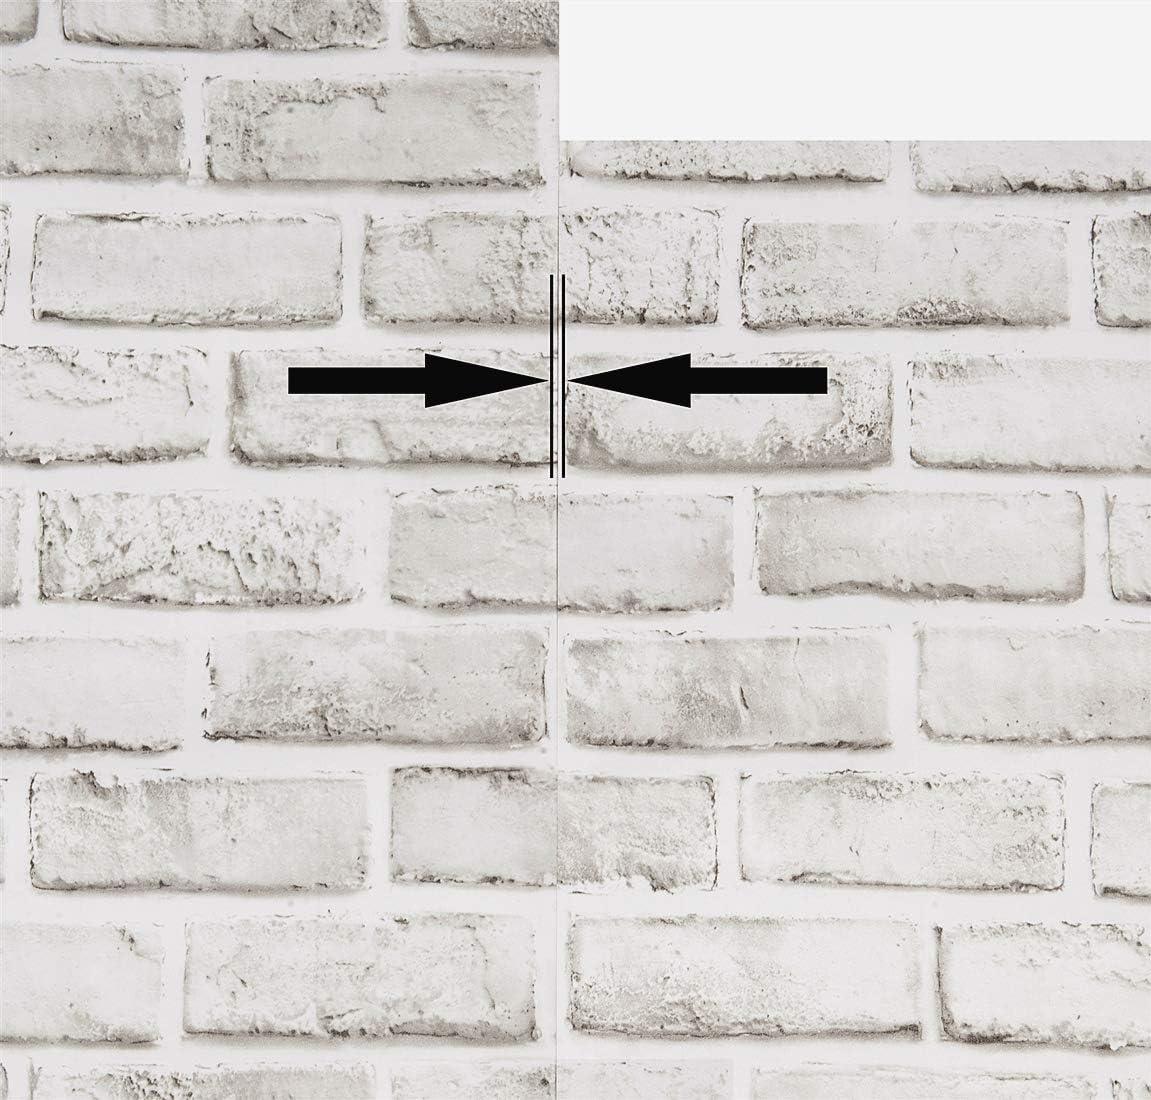 White Brick Peel And Stick Wallpaper Removable Wallpaper Cleanable Wall Paper Shelf Paper Self Adhesive Grey White Brick Vinyl Pattern Bathroom Backsplash 17 7 In X 393 7 In Fireplace Decoration Home Kitchen